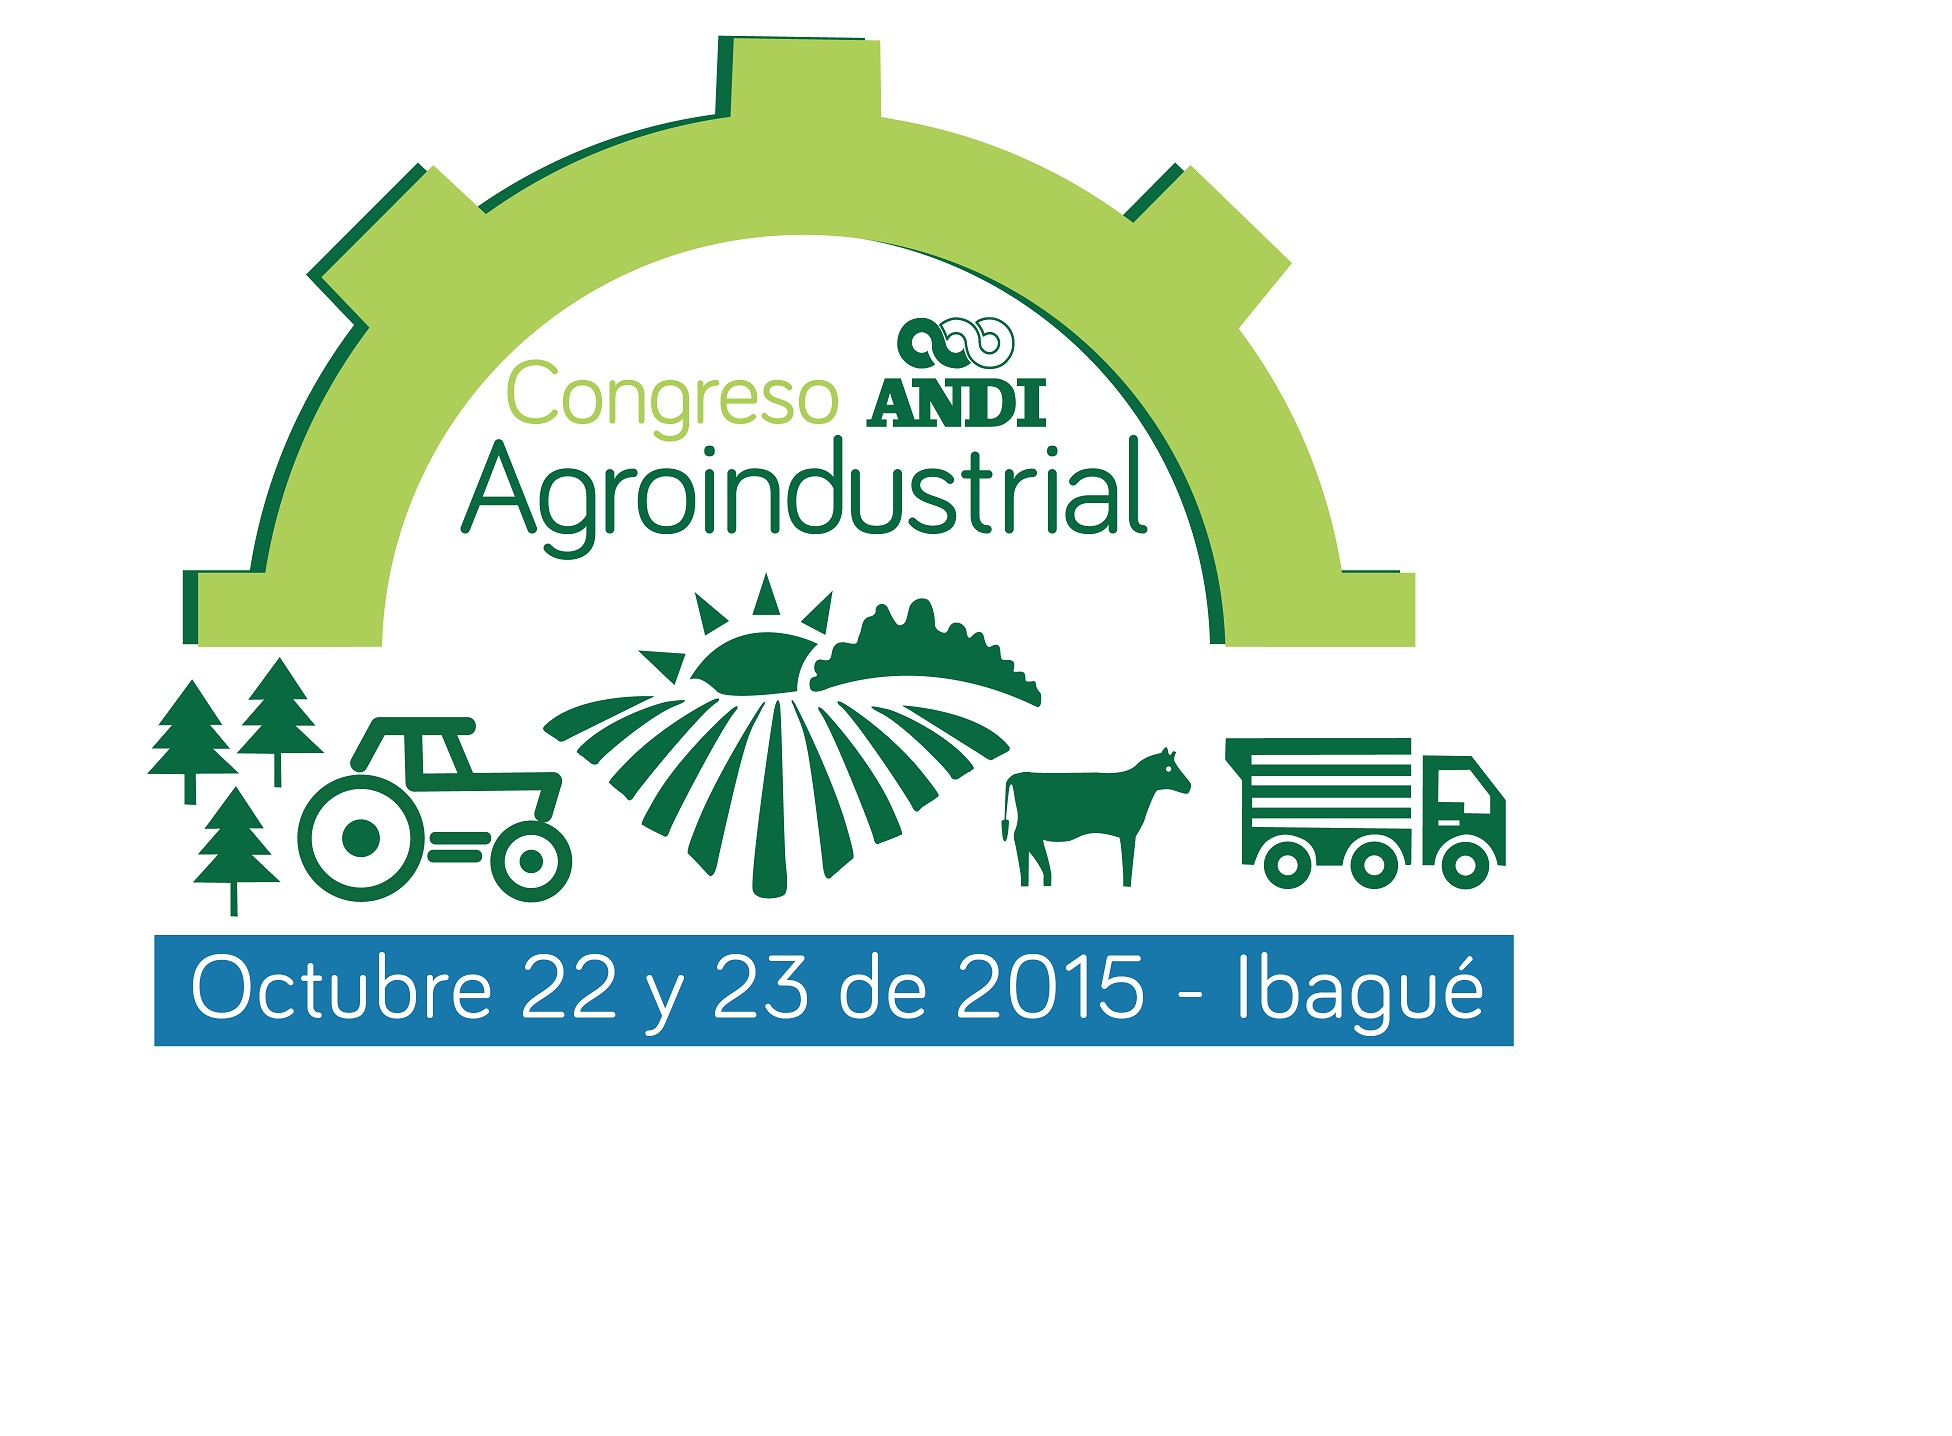 Congreso agroindustrial